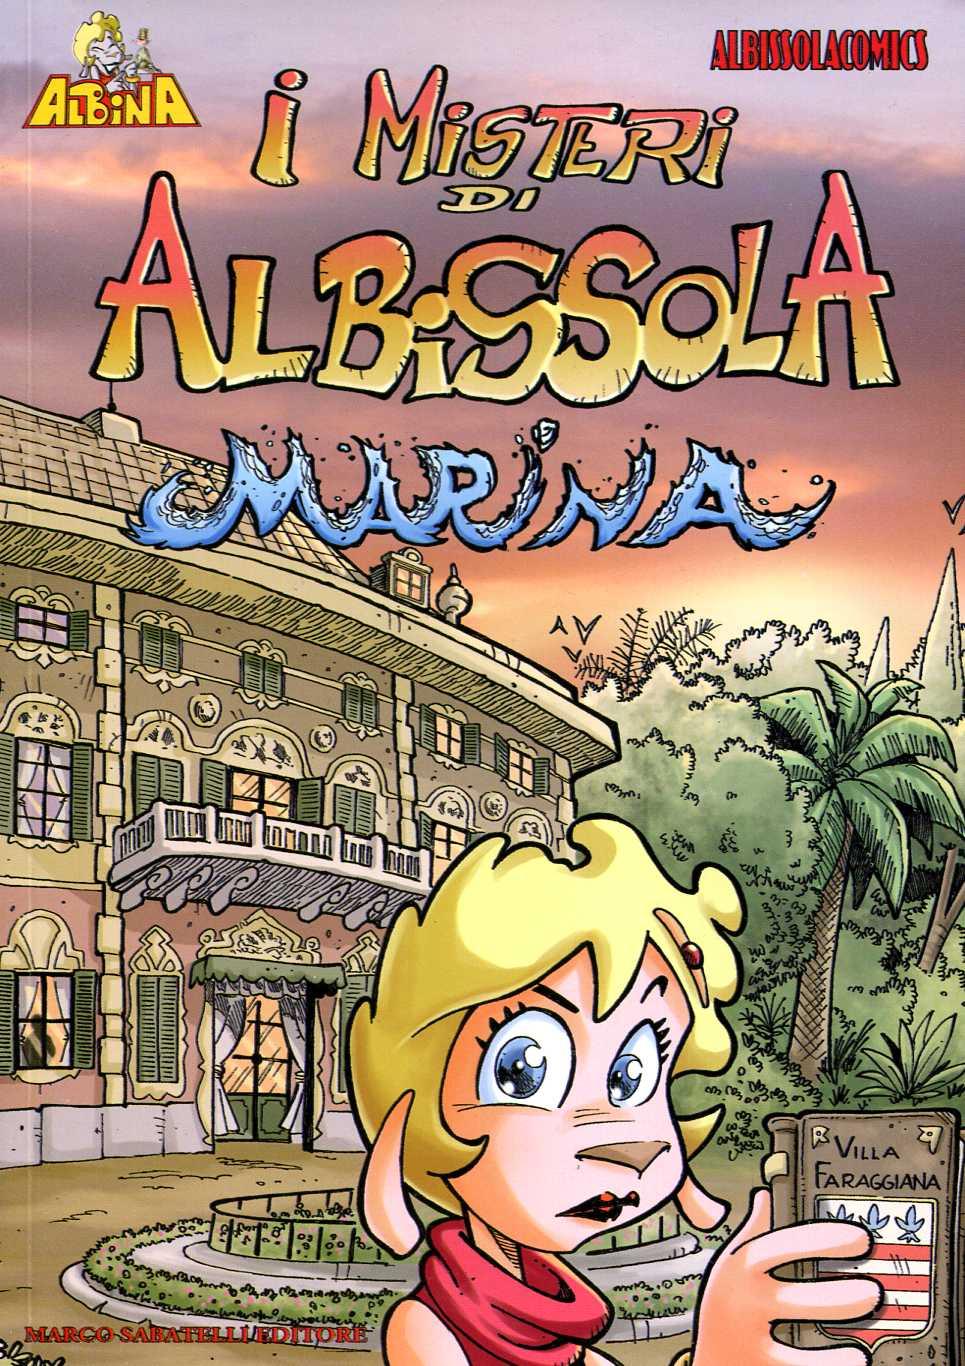 I Misteri di Albissola Marina